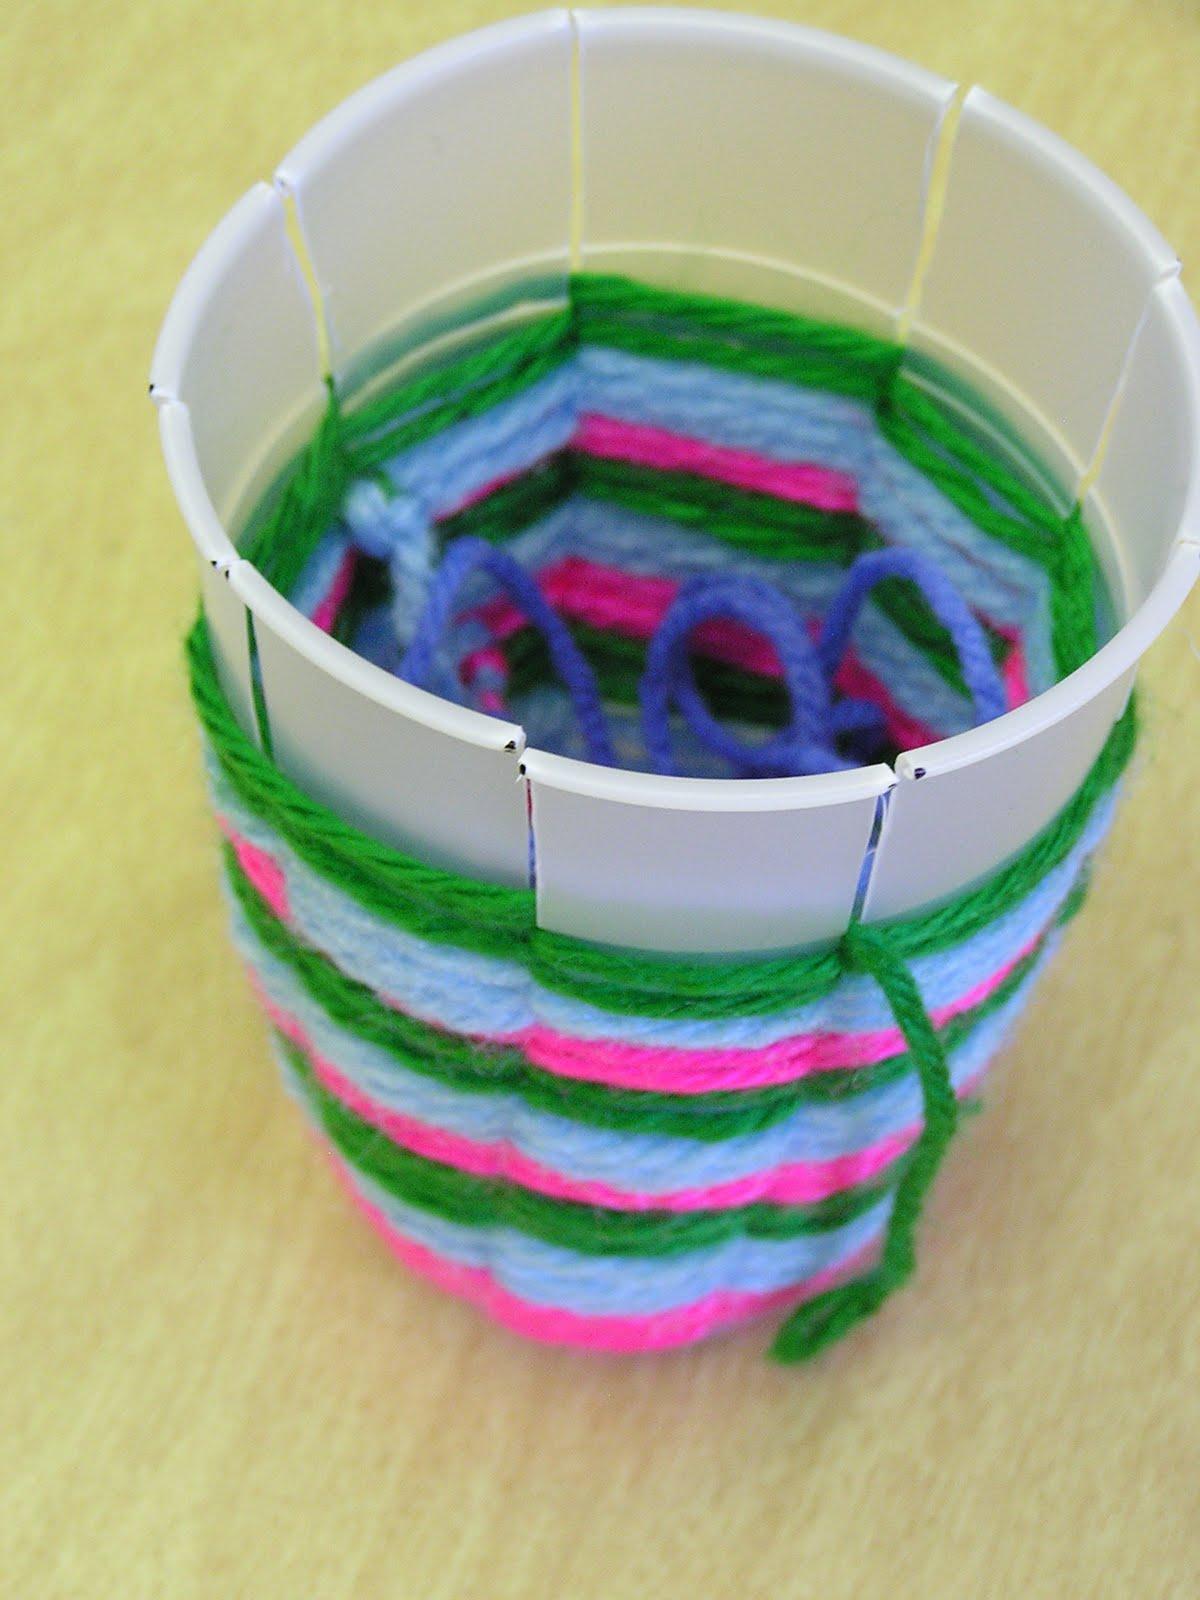 Basket Weaving For Elementary Students : B art z elementary student examples